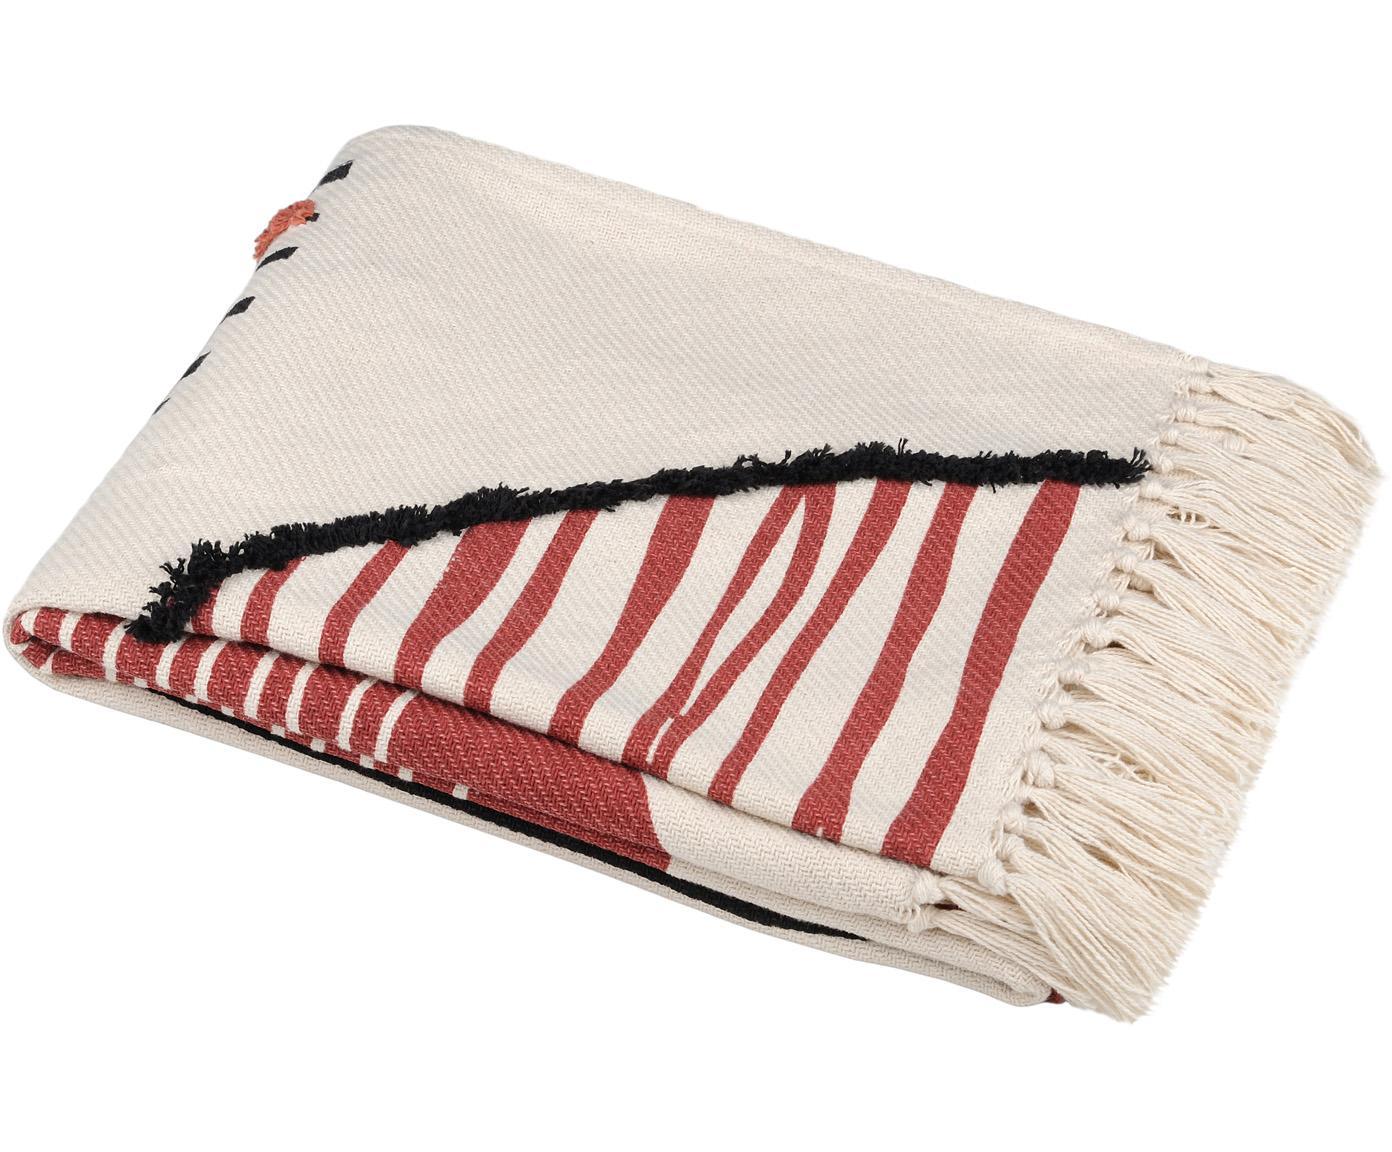 Plaid Dakar, 96% cotone, 4% elastan, Bianco, rosso, nero, Larg. 125 x Lung. 150 cm